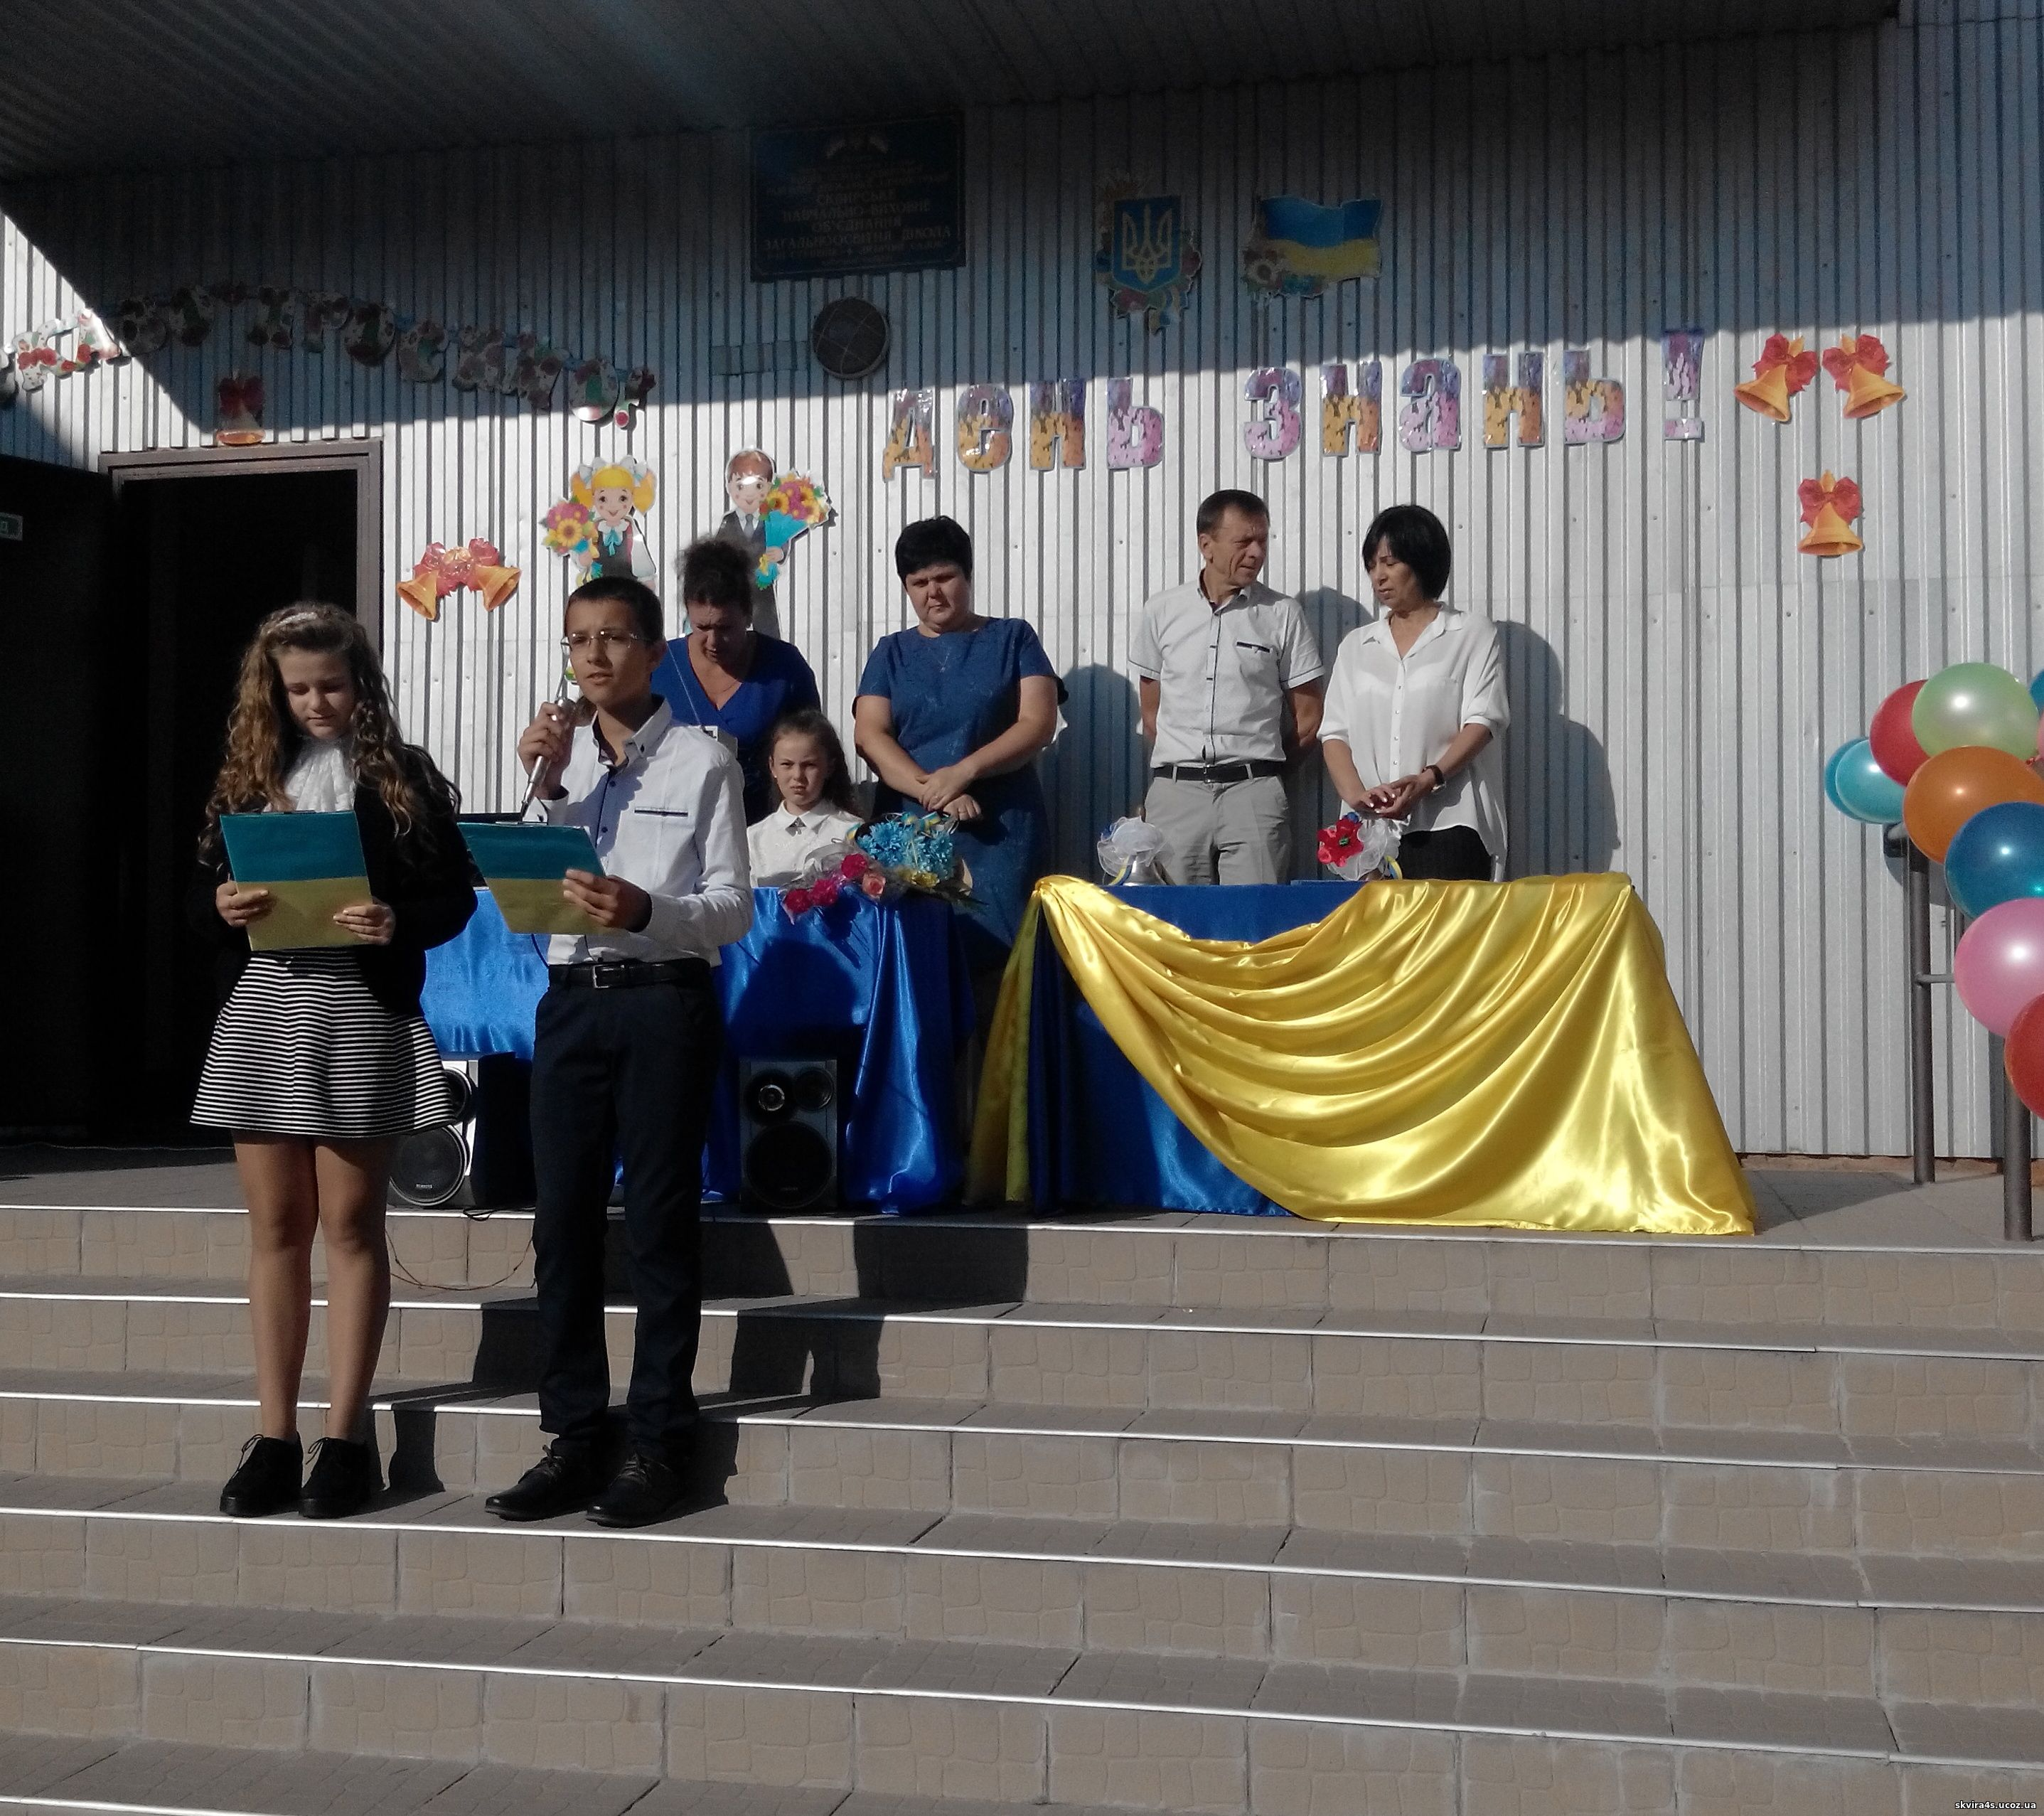 http://skvira4s.ucoz.ua/foto/01-09-2017/2017901090138.jpg